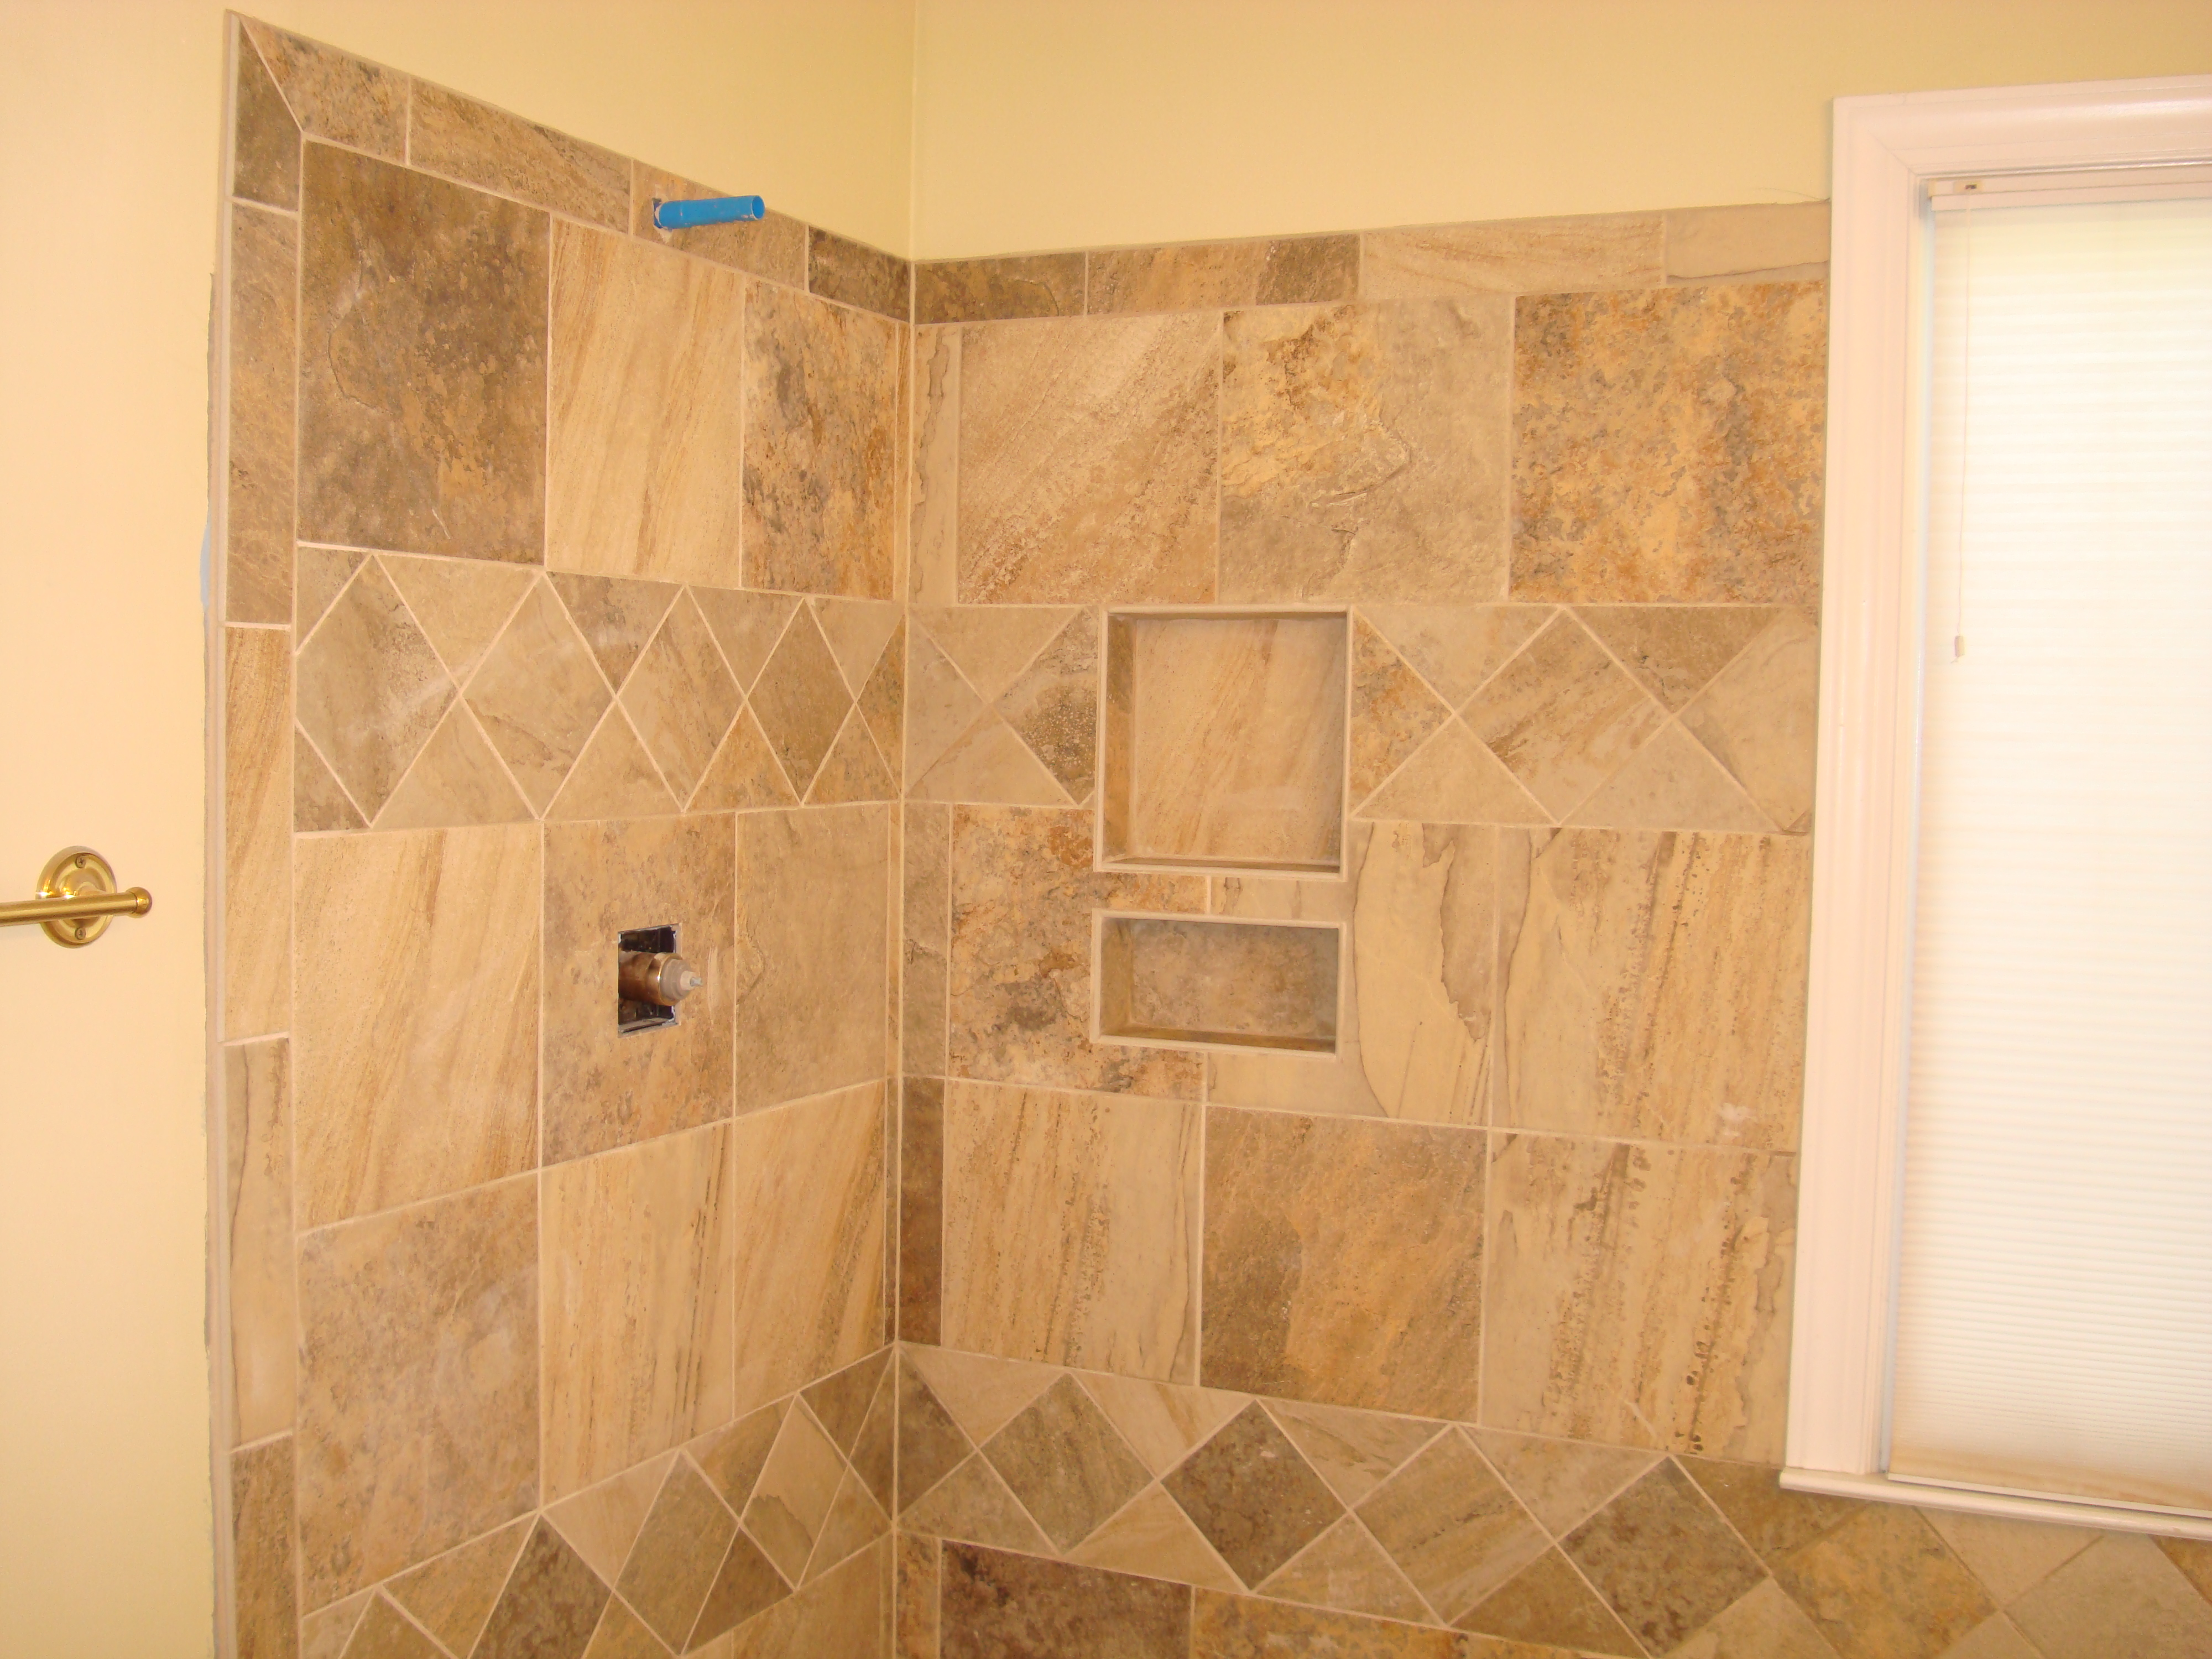 Ceramic tile on wall of bathroom